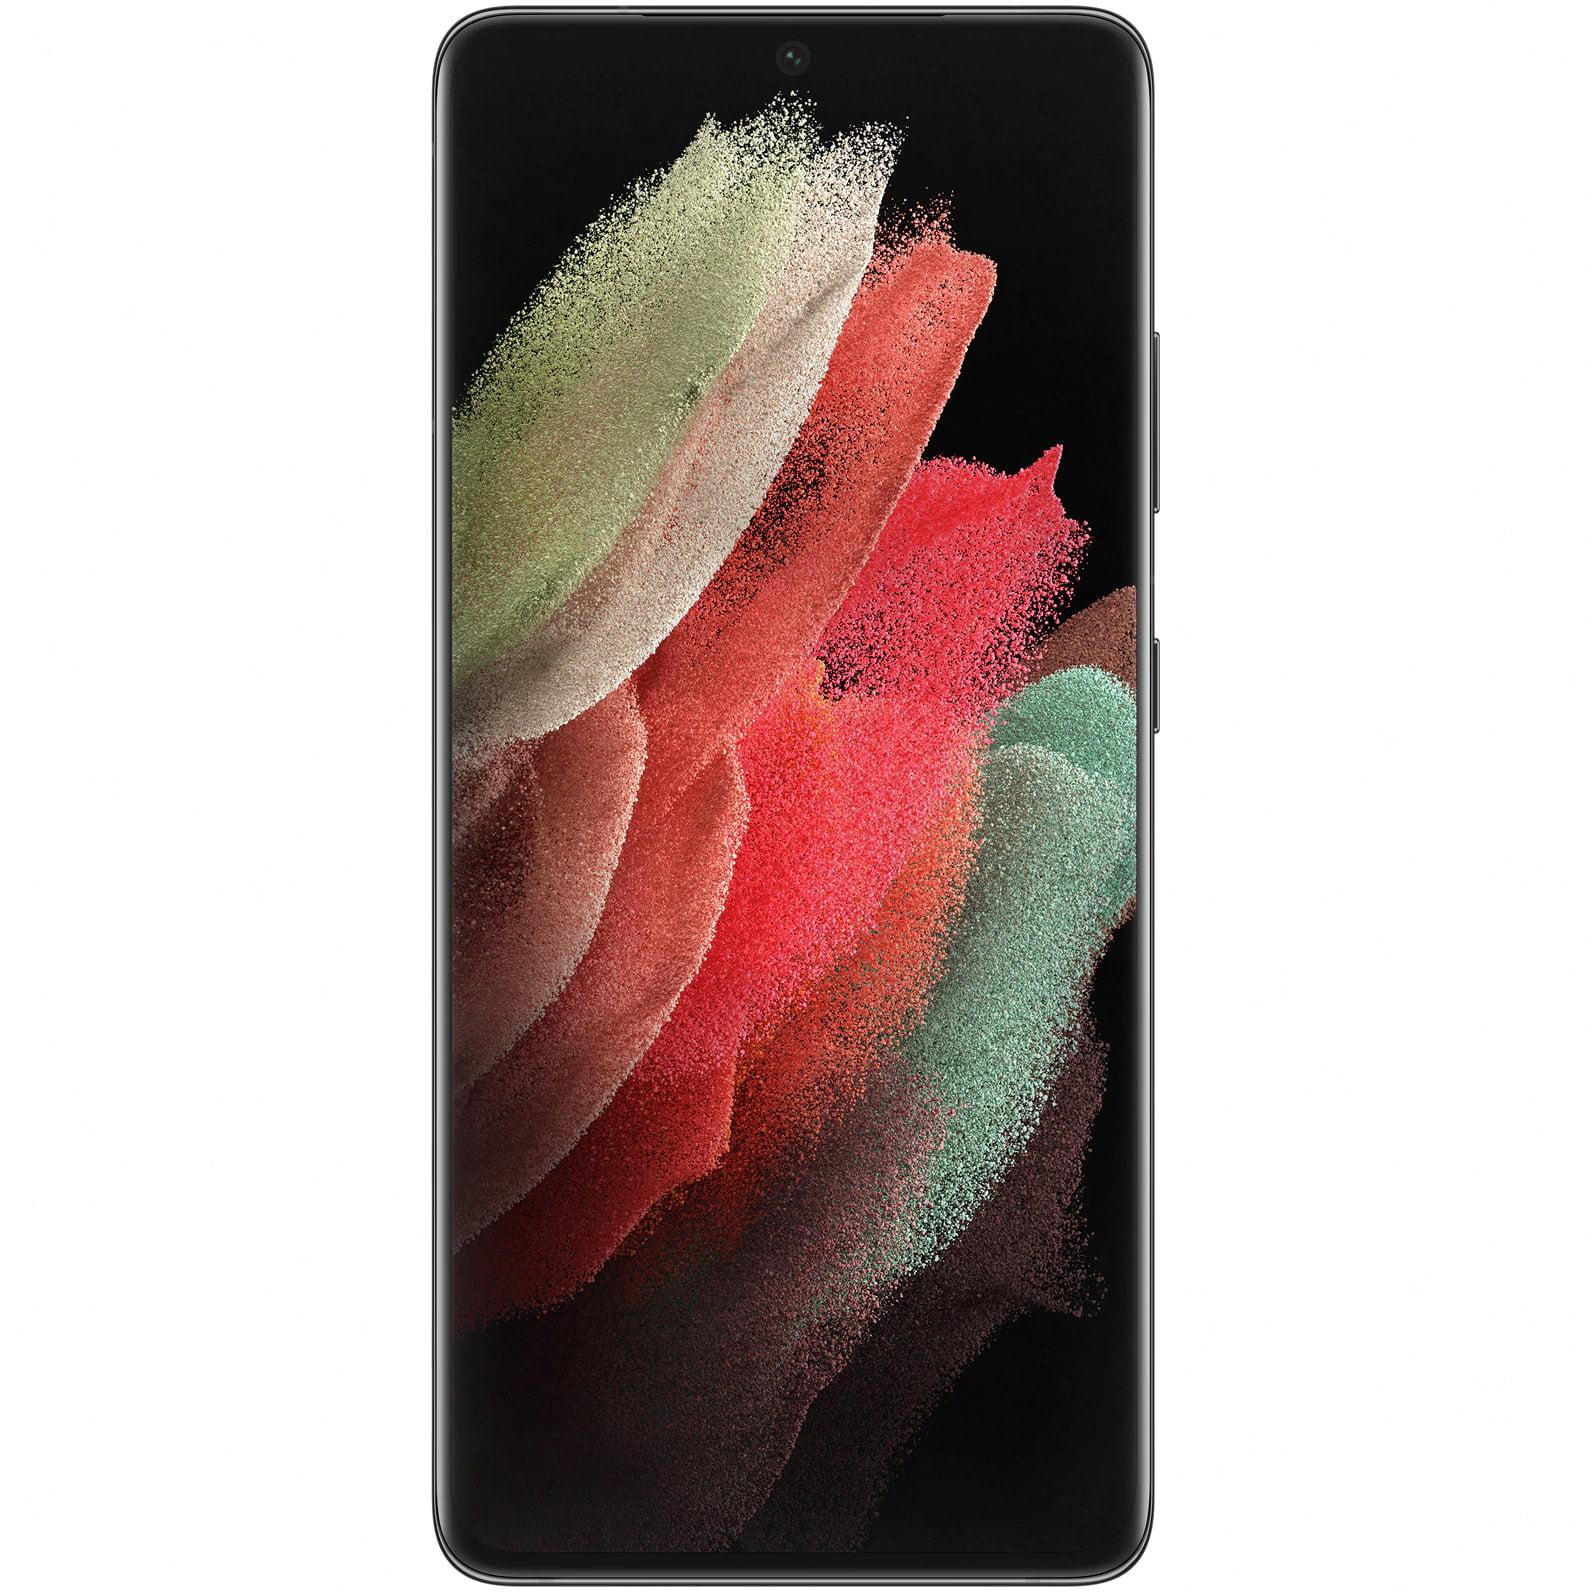 Telefon mobil Samsung Galaxy S21 Ultra, Dual SIM, 256GB, 12GB RAM, 5G, Phantom Black